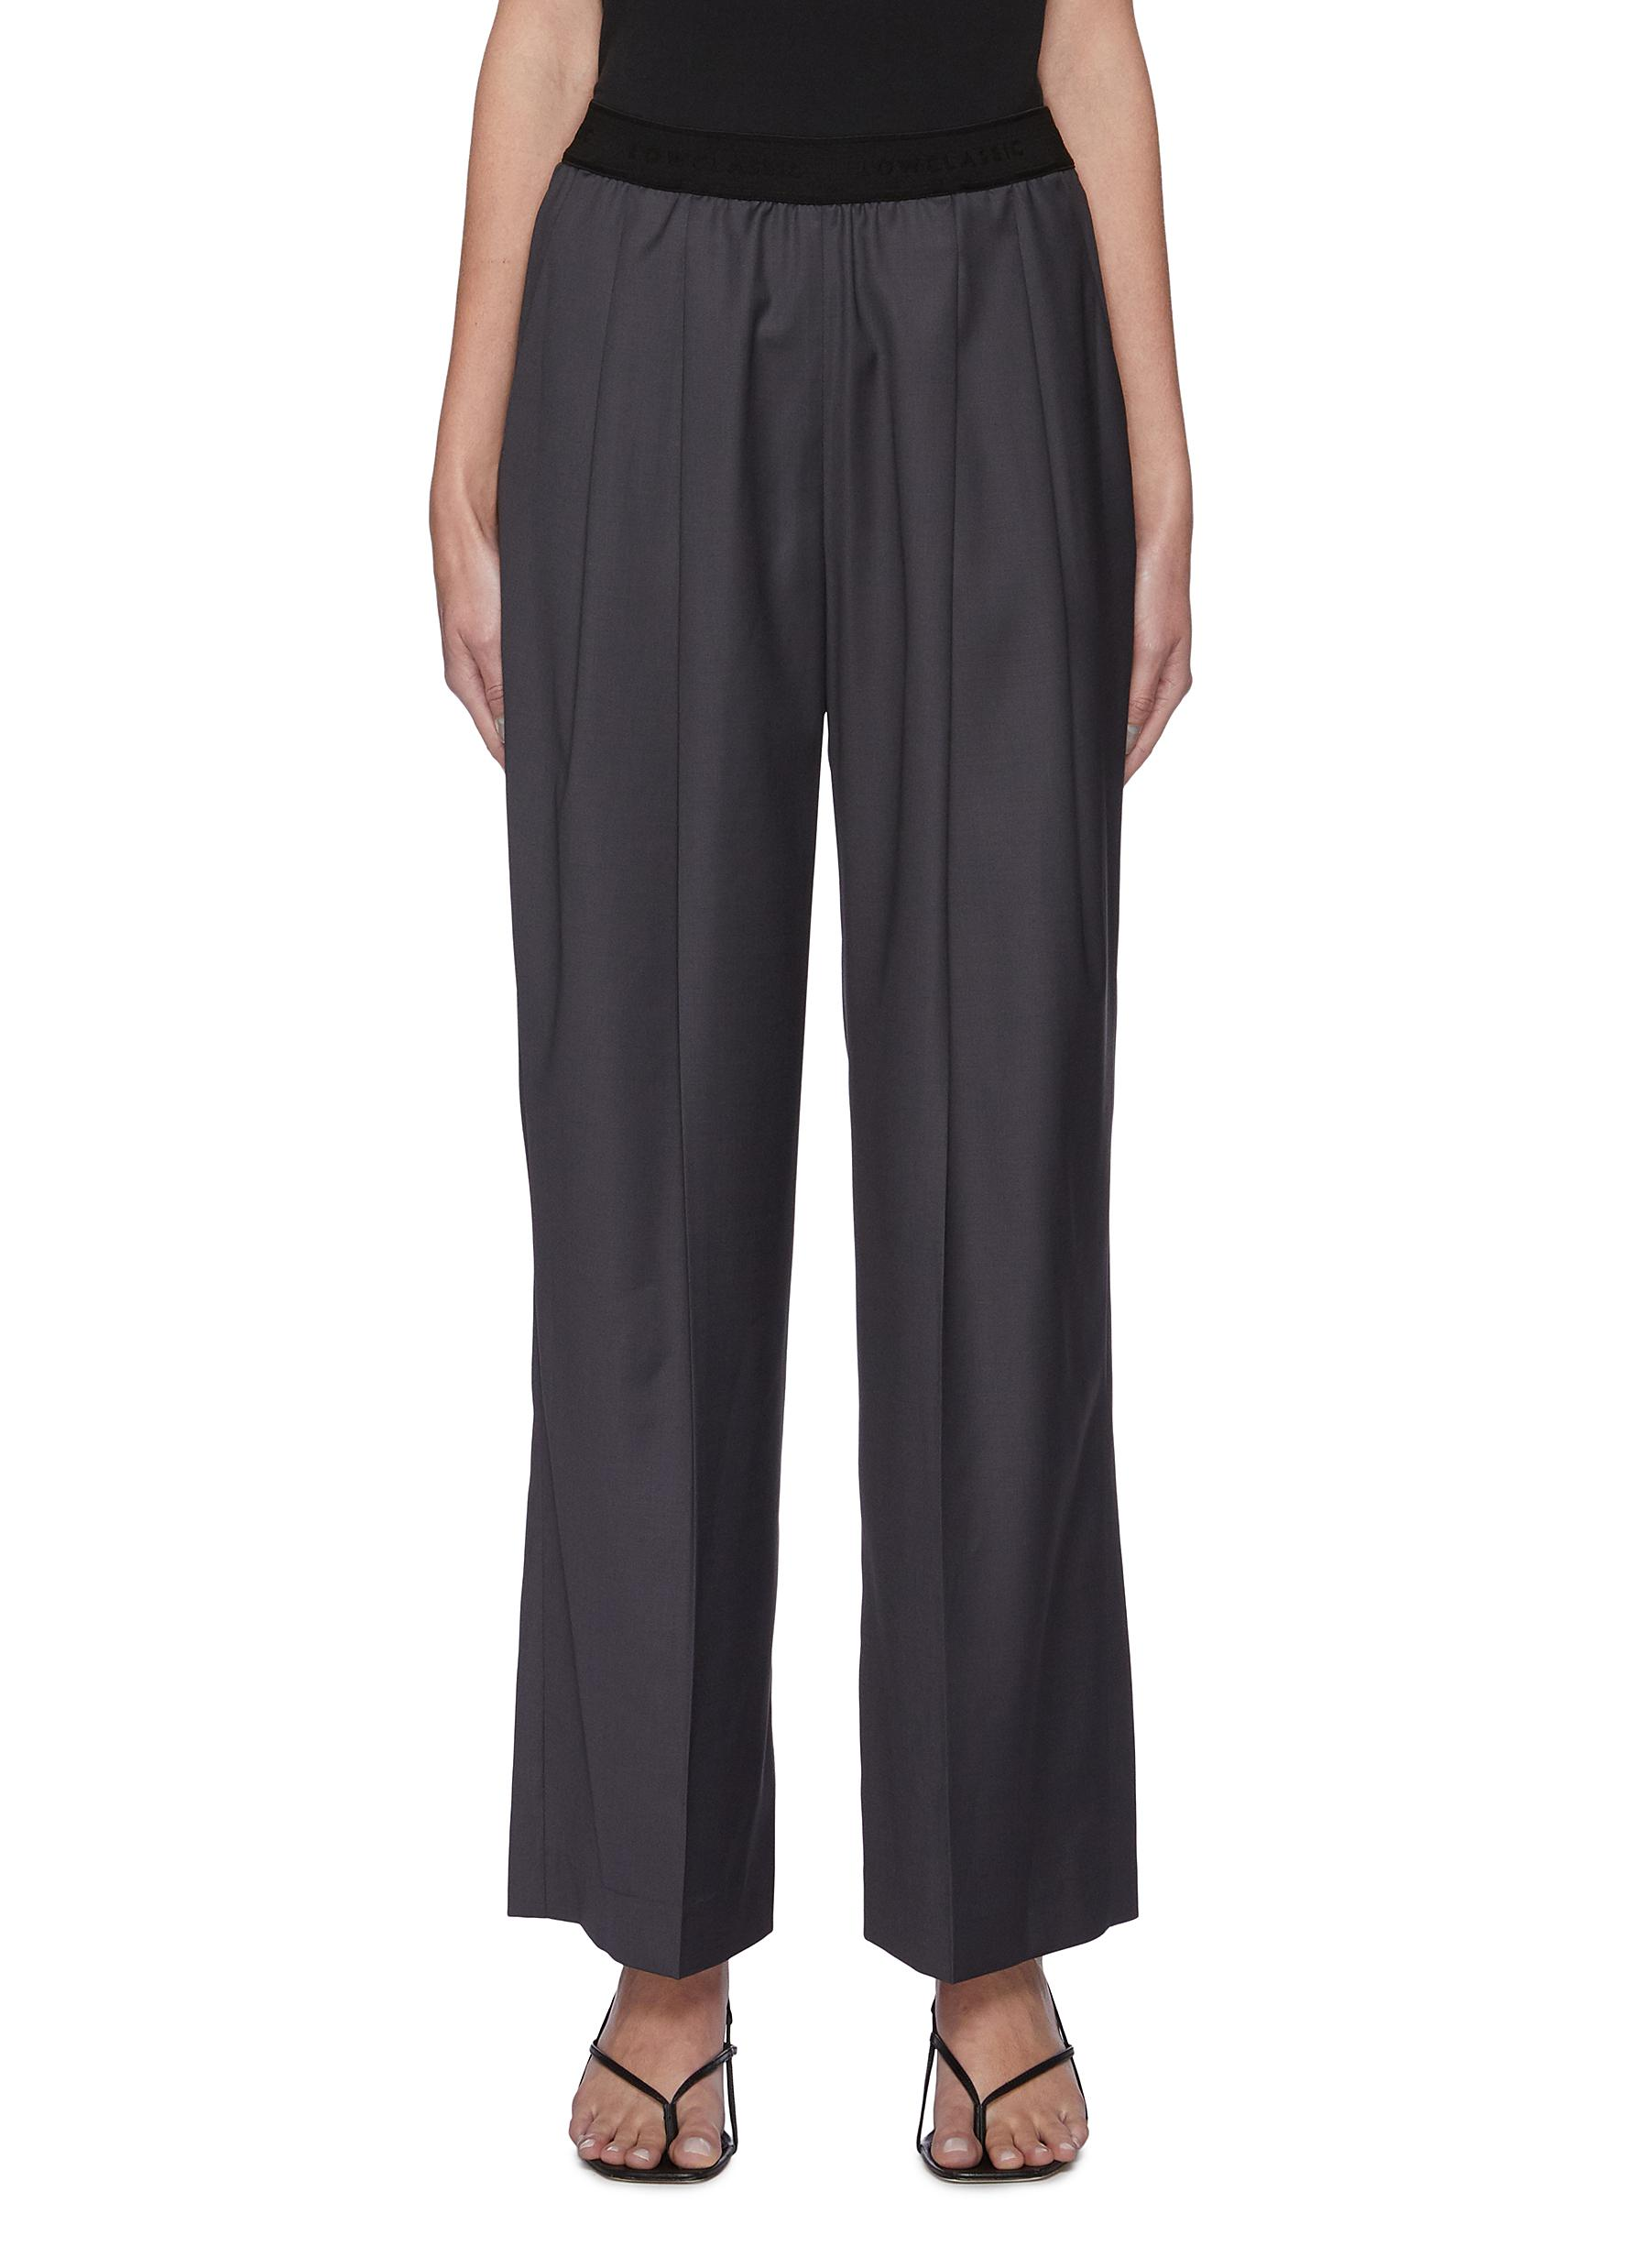 Low Classic Wools ELASTIC WAIST FRONT PLEAT WOOL BLEND PANTS